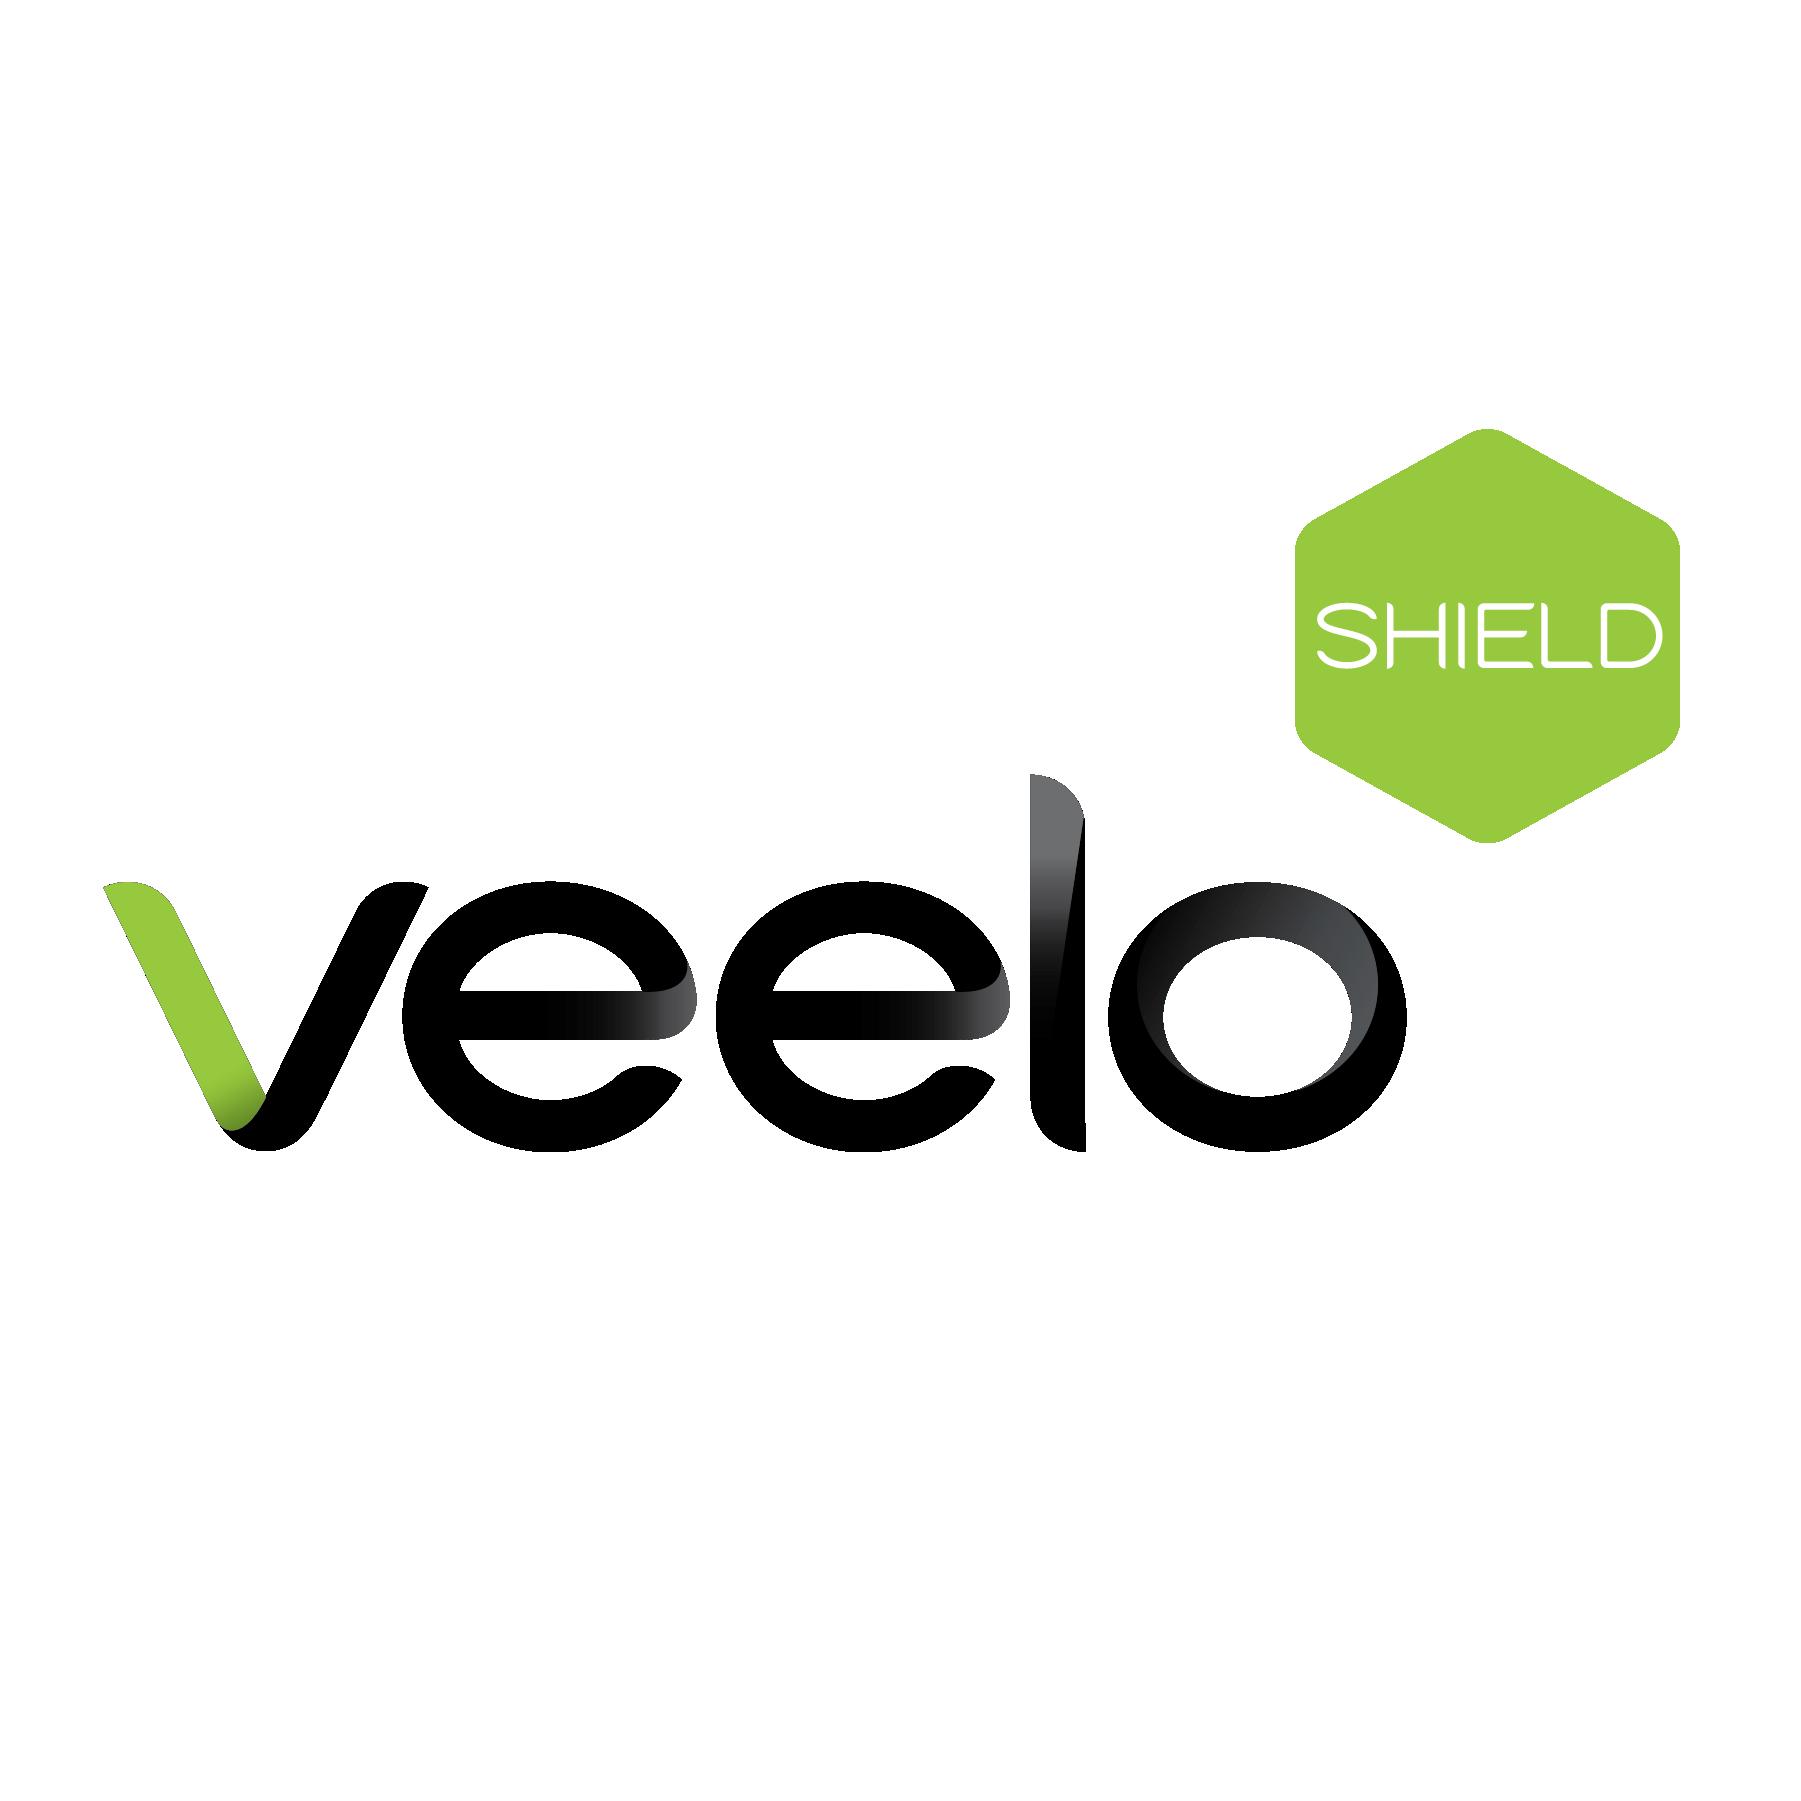 Veelo_Shield.png